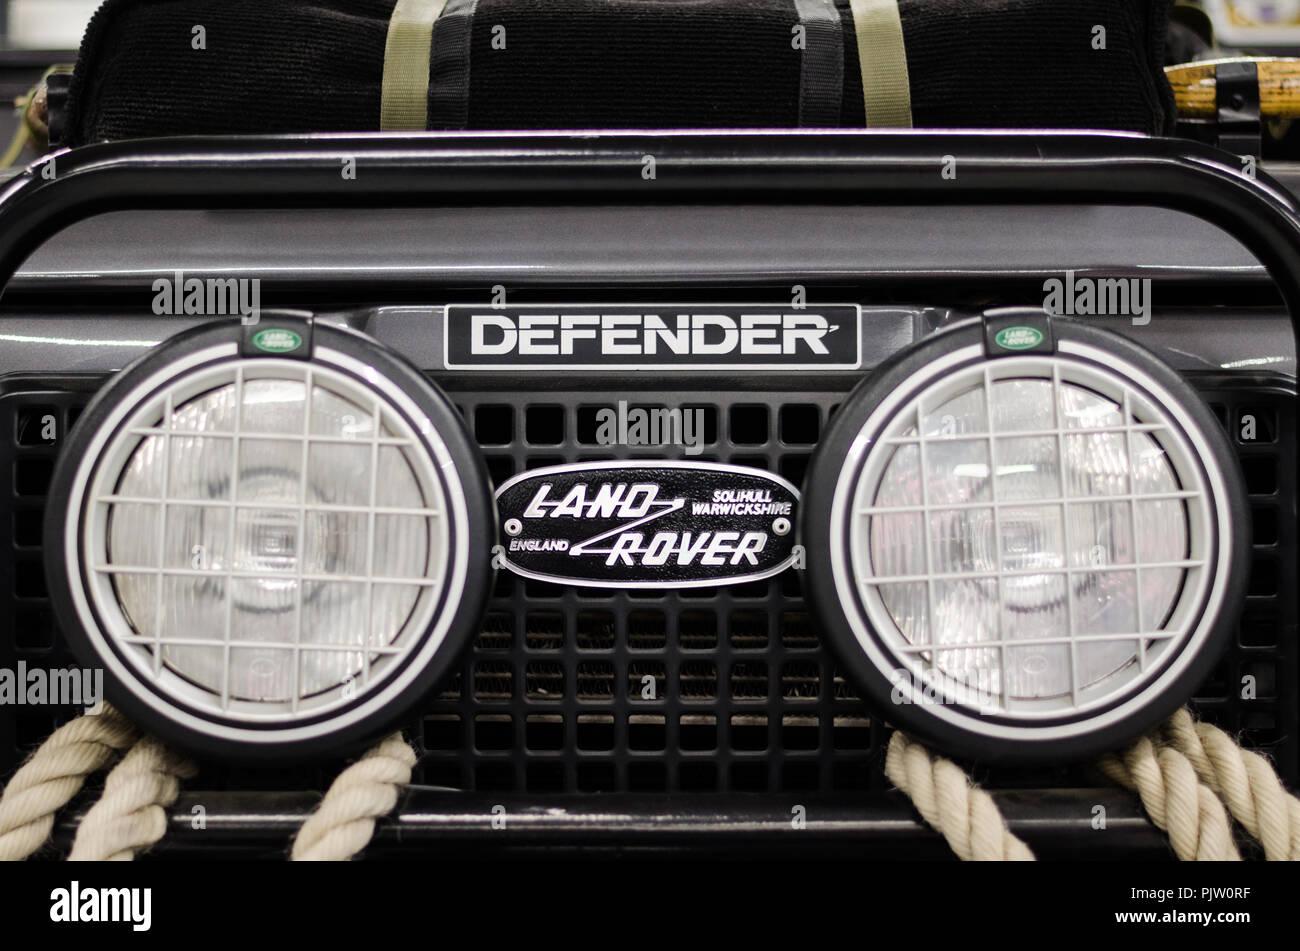 Land Rover Defender logo - Stock Image